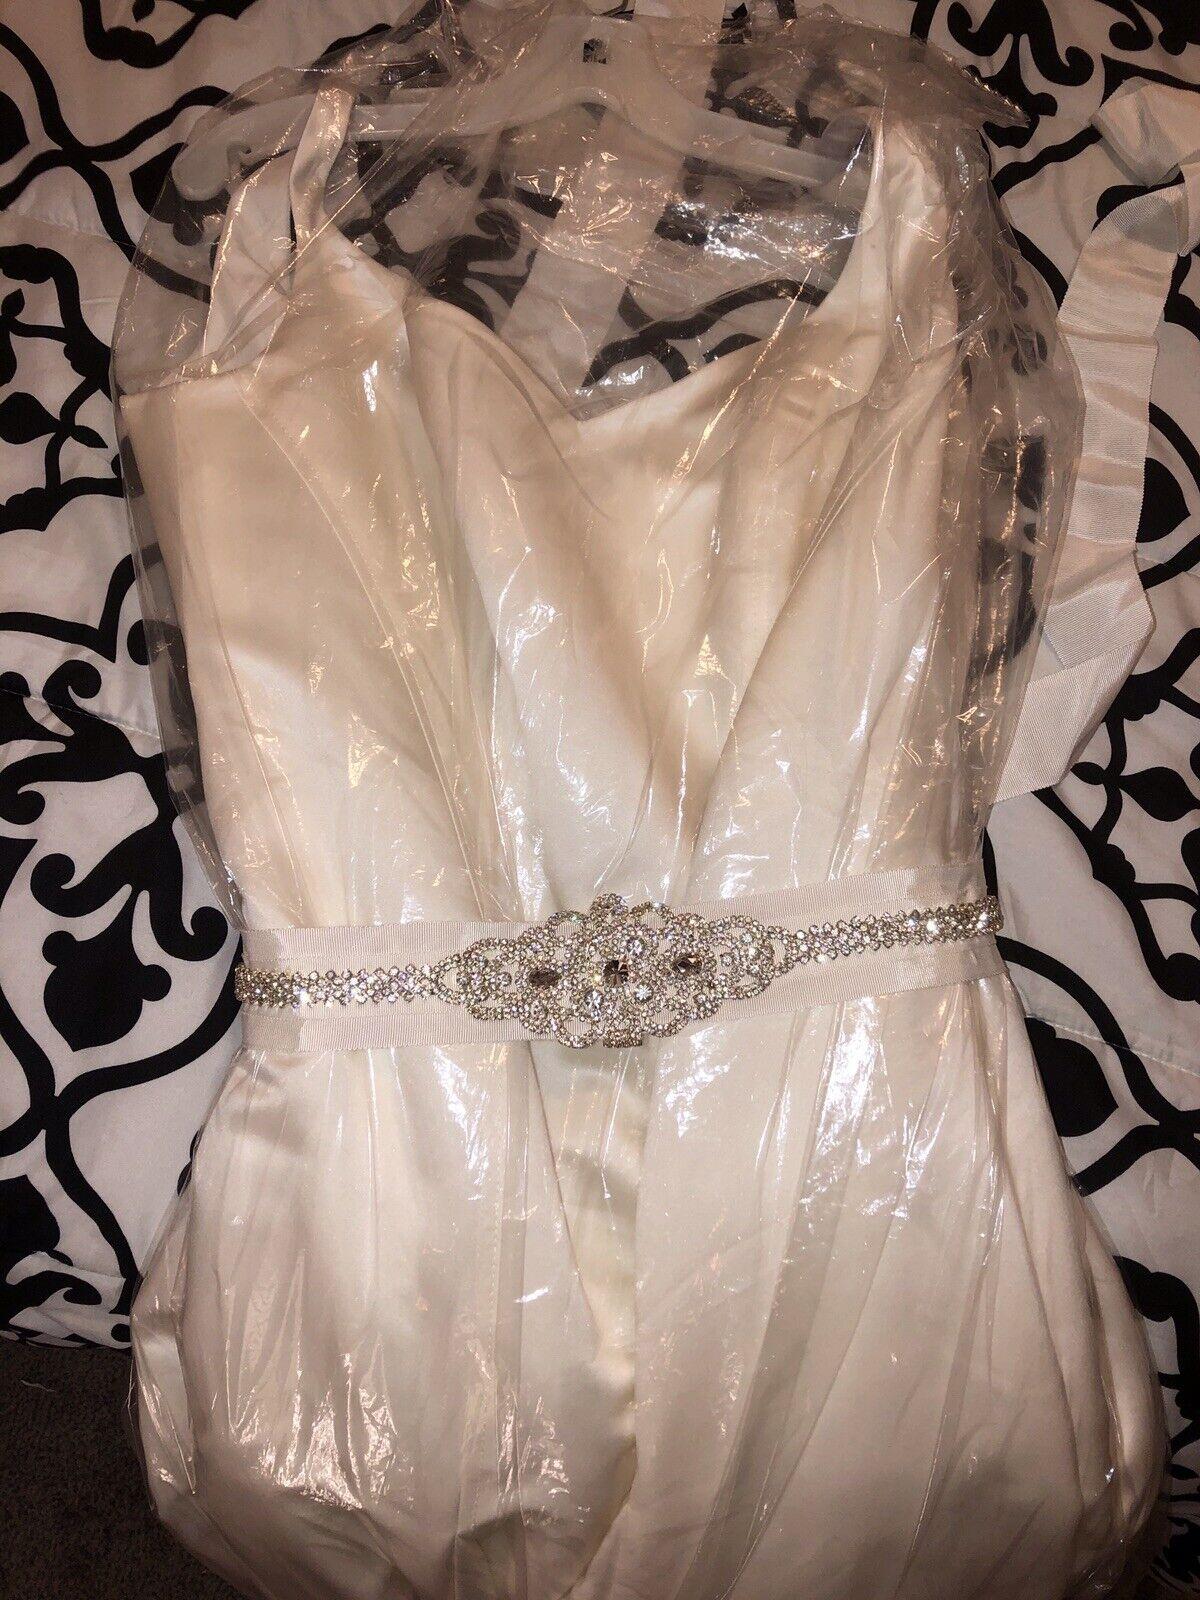 Wedding Dress David Bridal Ivory Size 16W Sleeveless With Lace Brand New w tags